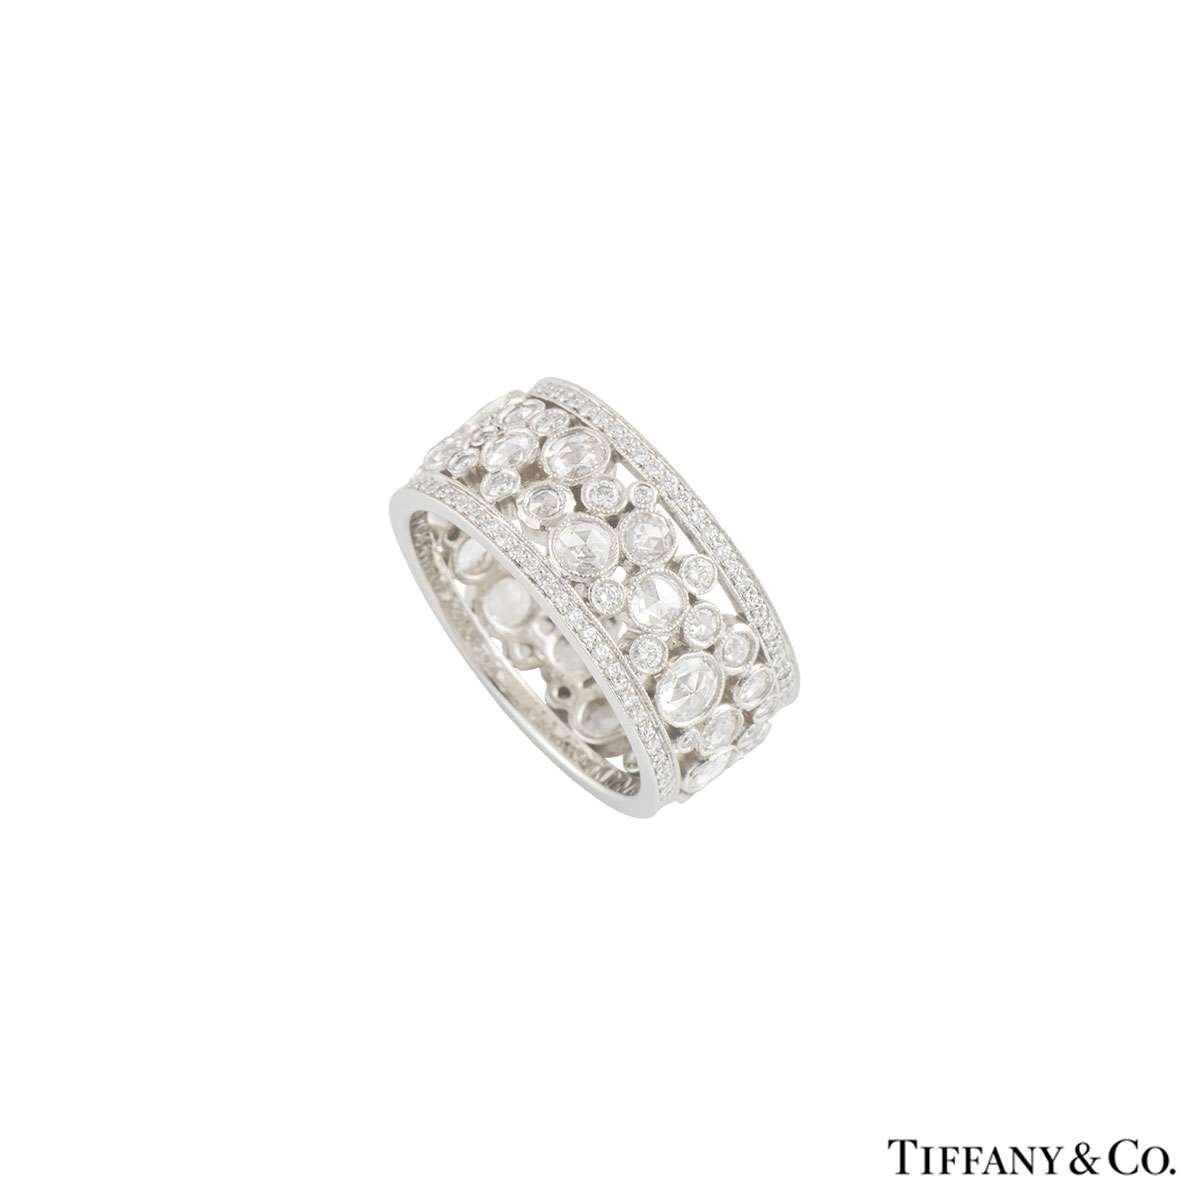 Tiffany & Co. Cobblestone Diamond Band Ring